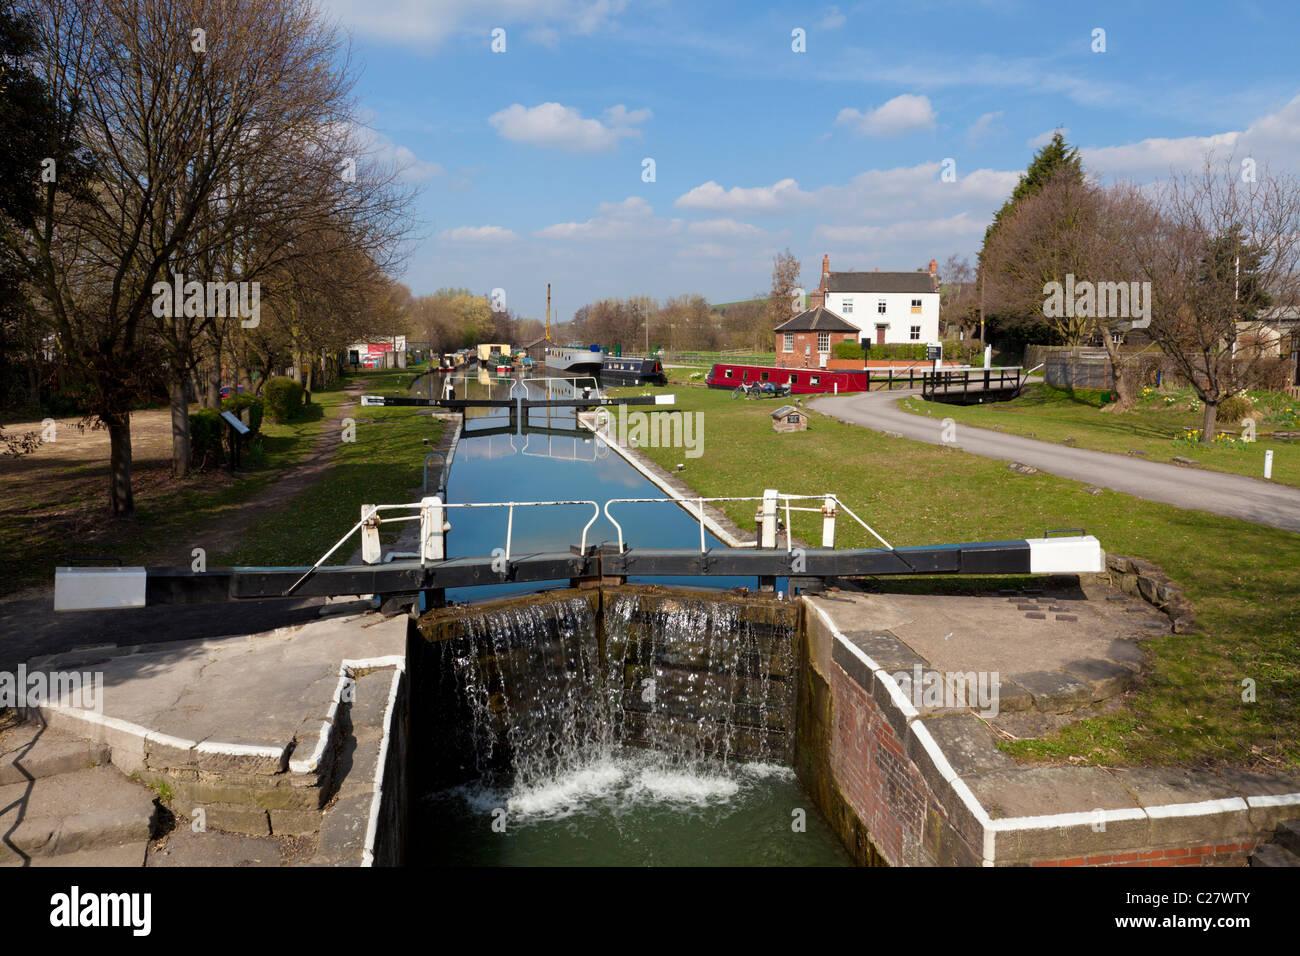 Lock gates on the Erewash canal near Langley Mill, Derbyshire, England, GB, UK, EU, Europe - Stock Image